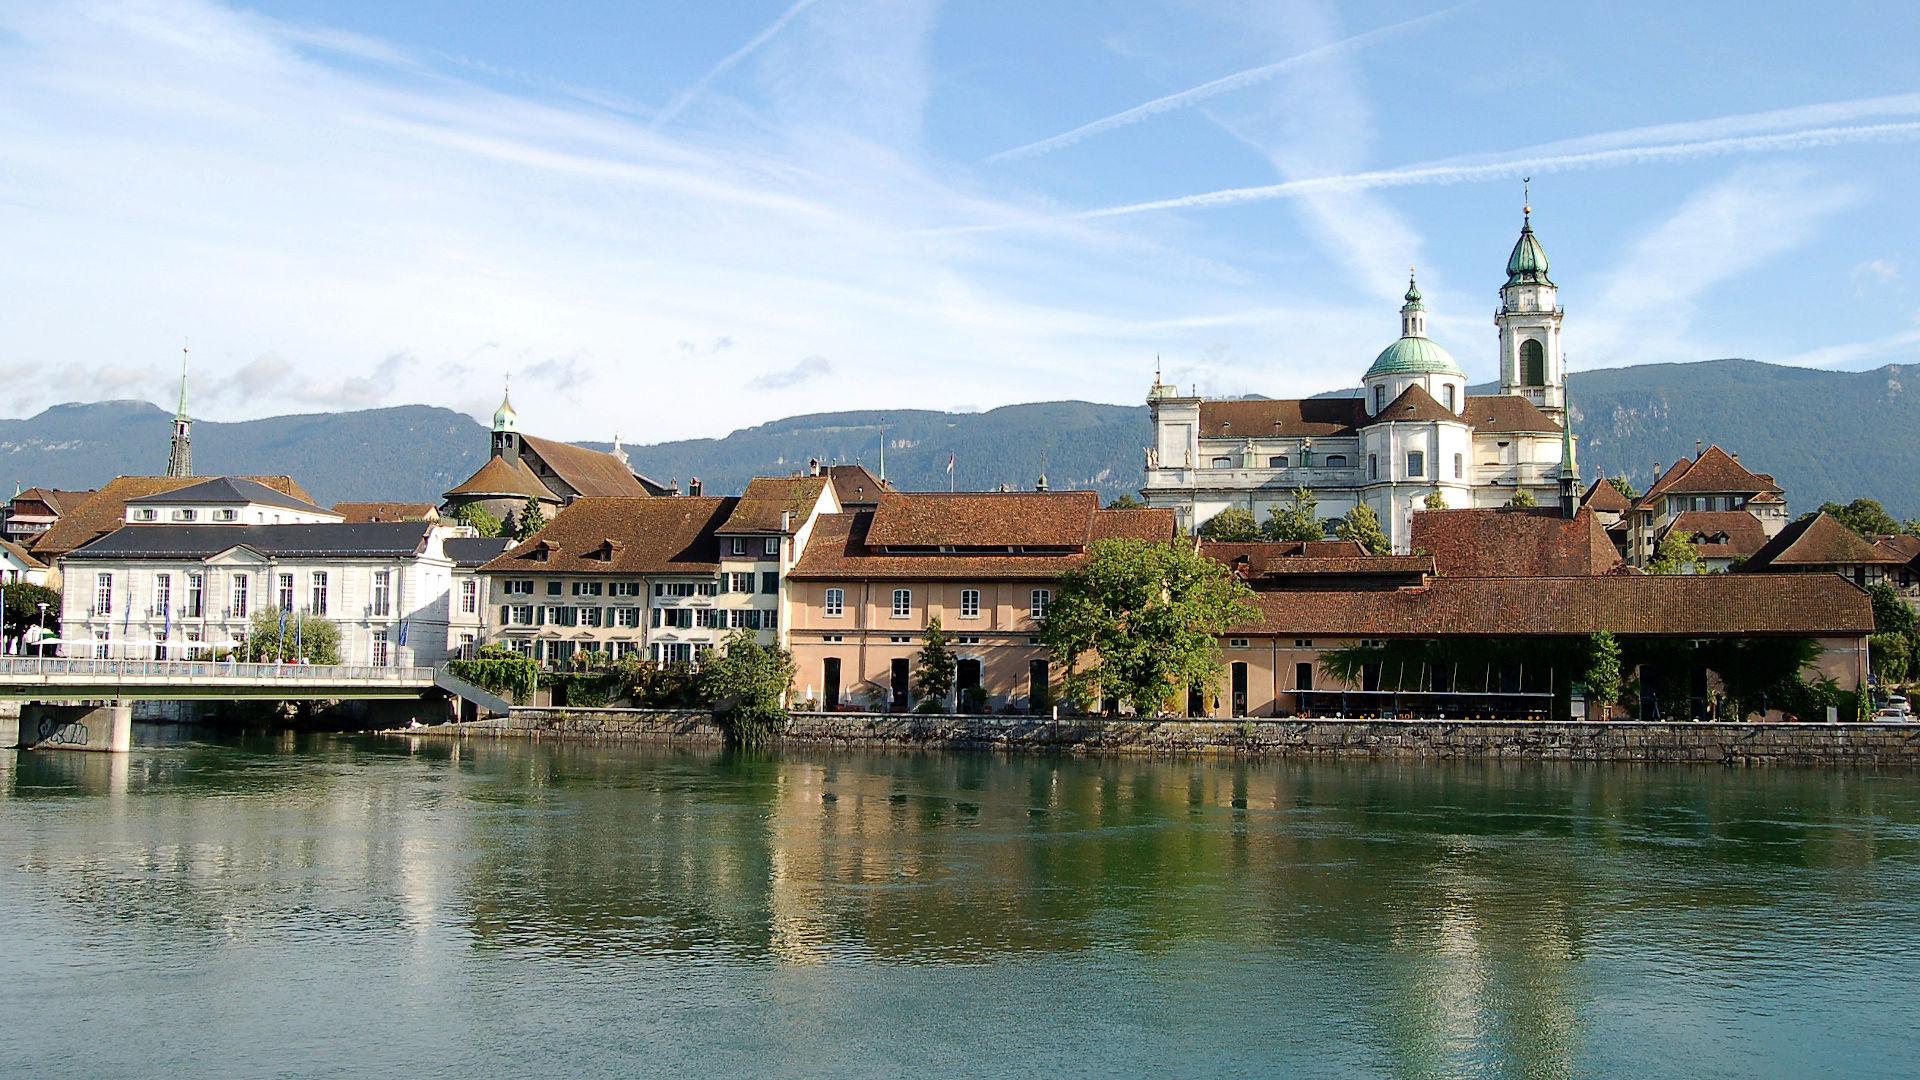 Solothurn, Blick auf die Altstadt